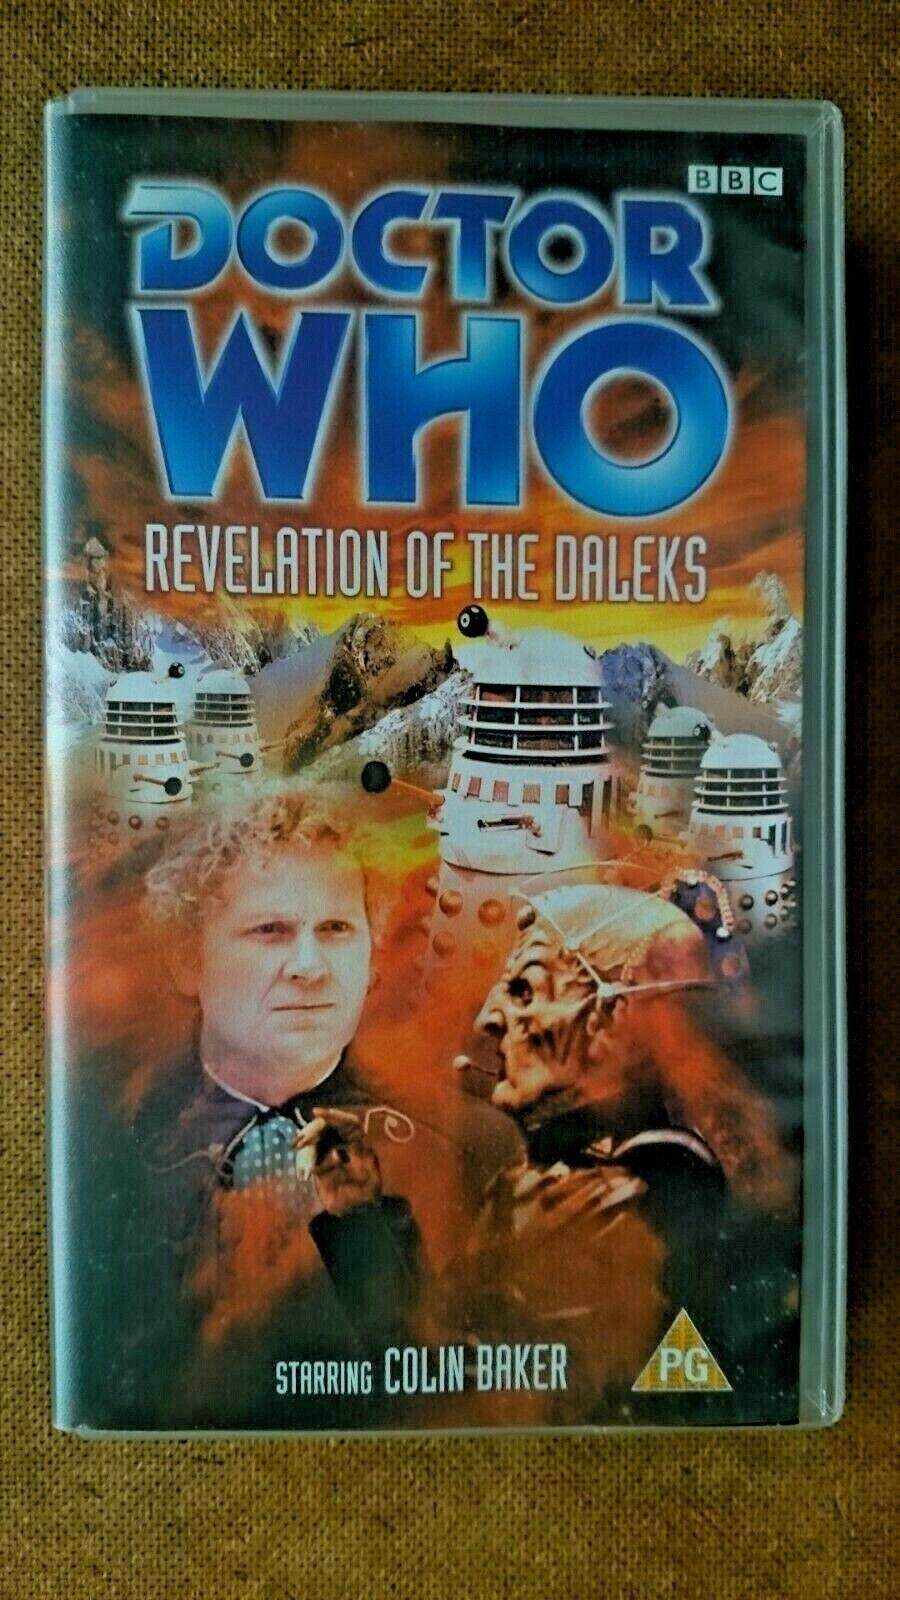 Doctor Who - Revelation Of The Daleks (VHS, 1999) - Colin Baker